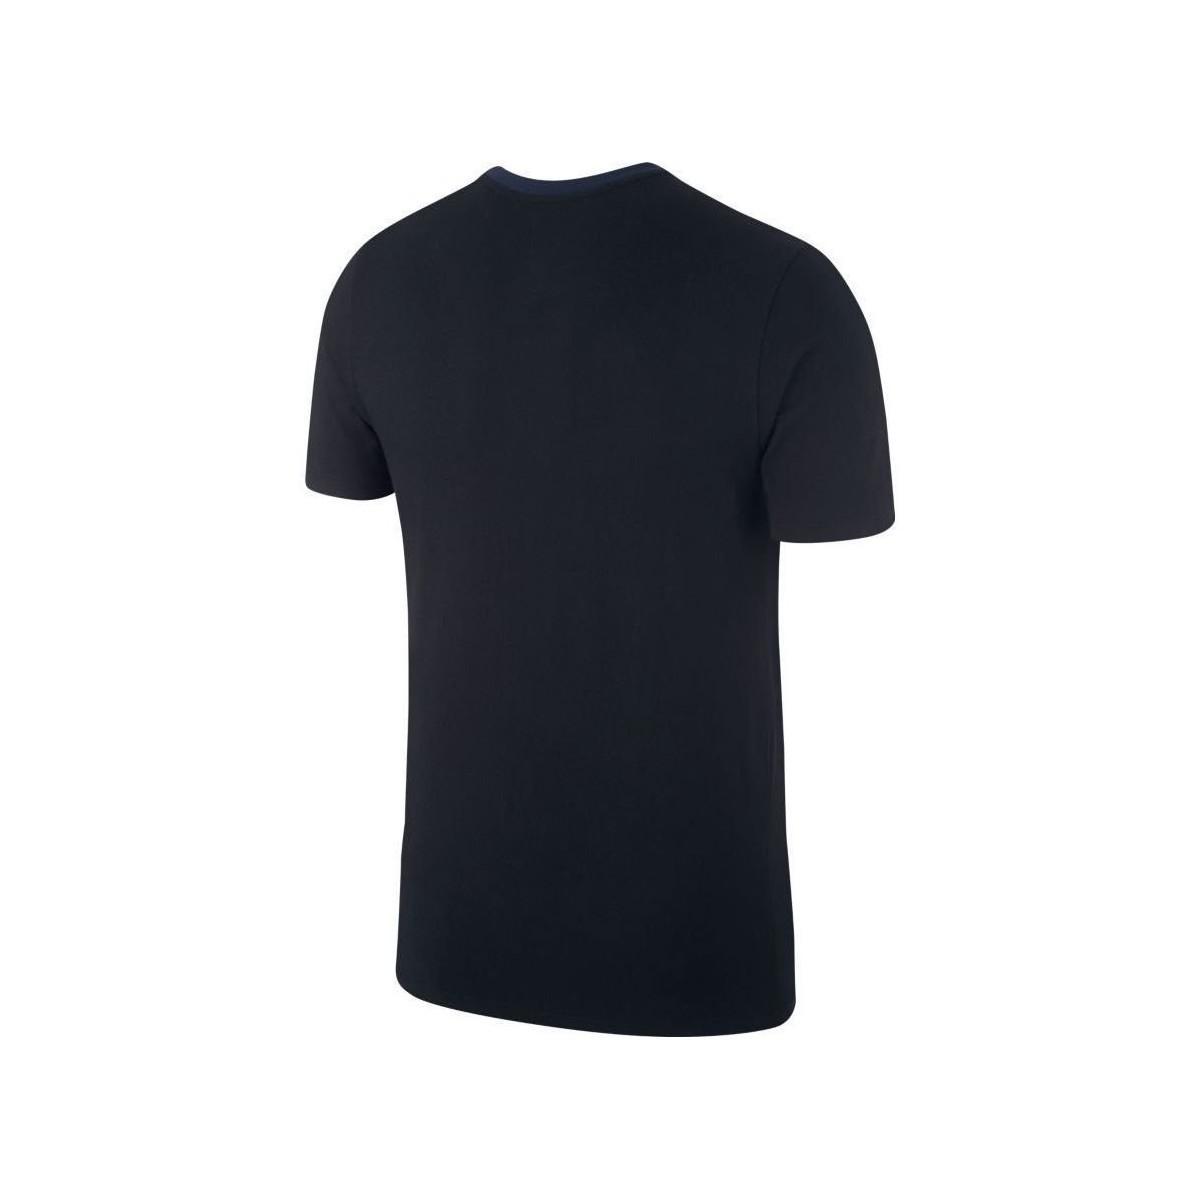 2cea9705 Nike 2018-2019 Croatia Crest Tee Women's T Shirt In Black in Black ...